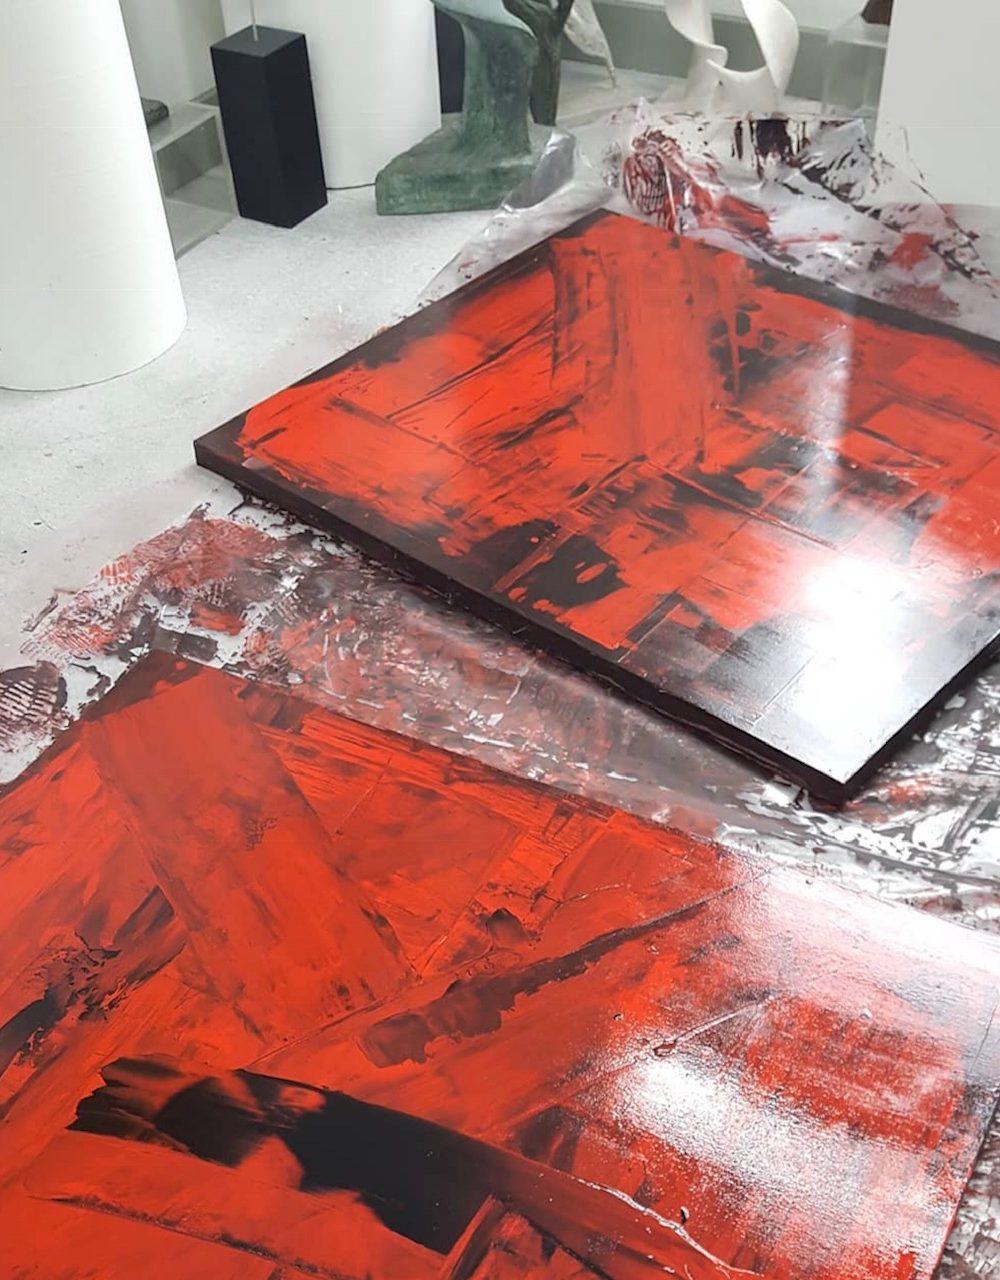 Varnishing new Paintings